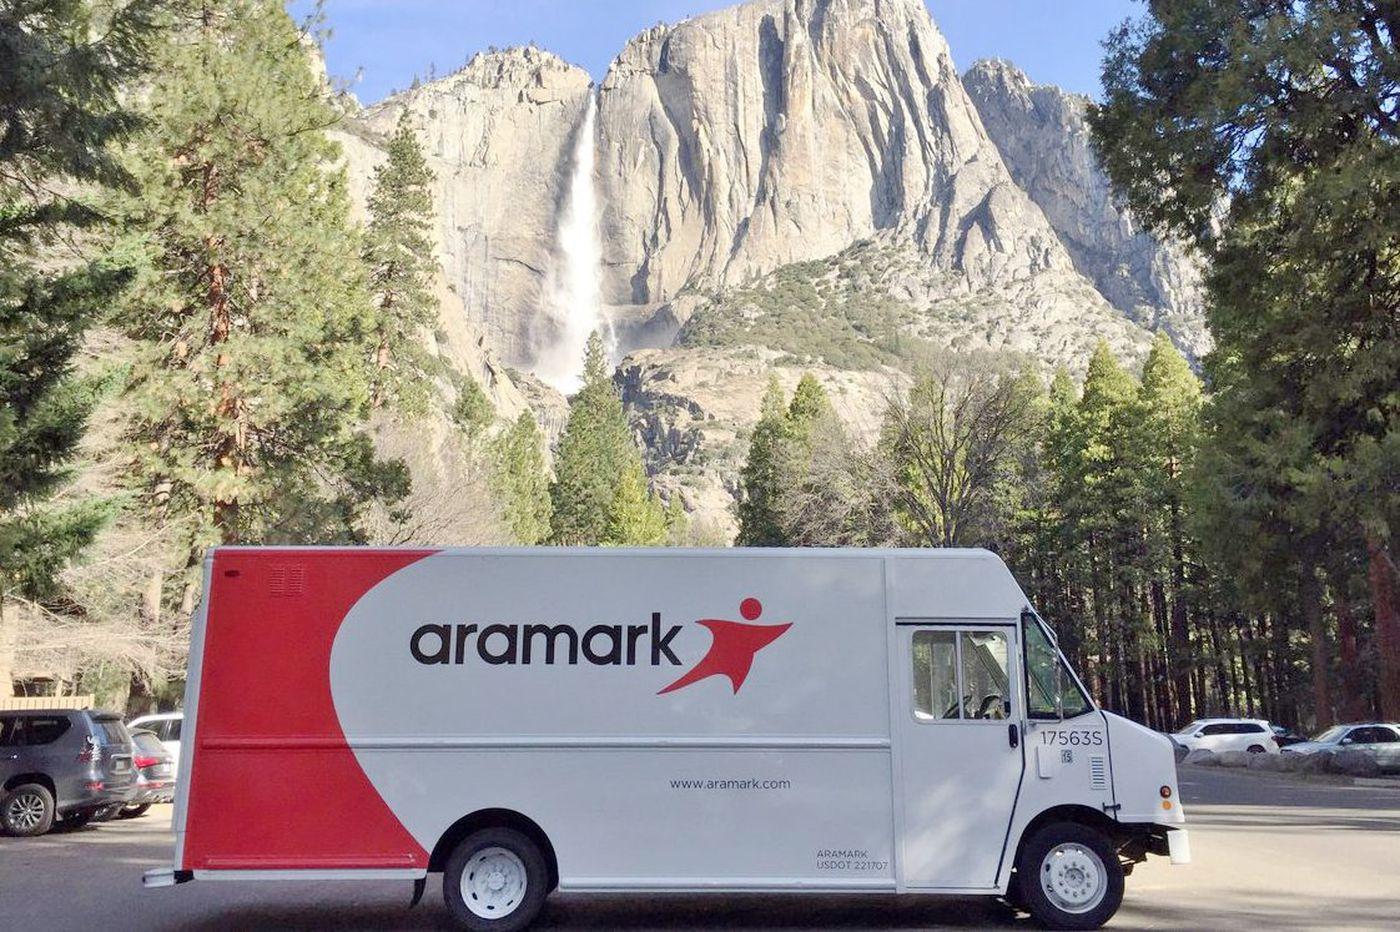 Aramark announces major acquisitions worth $2 billion-plus